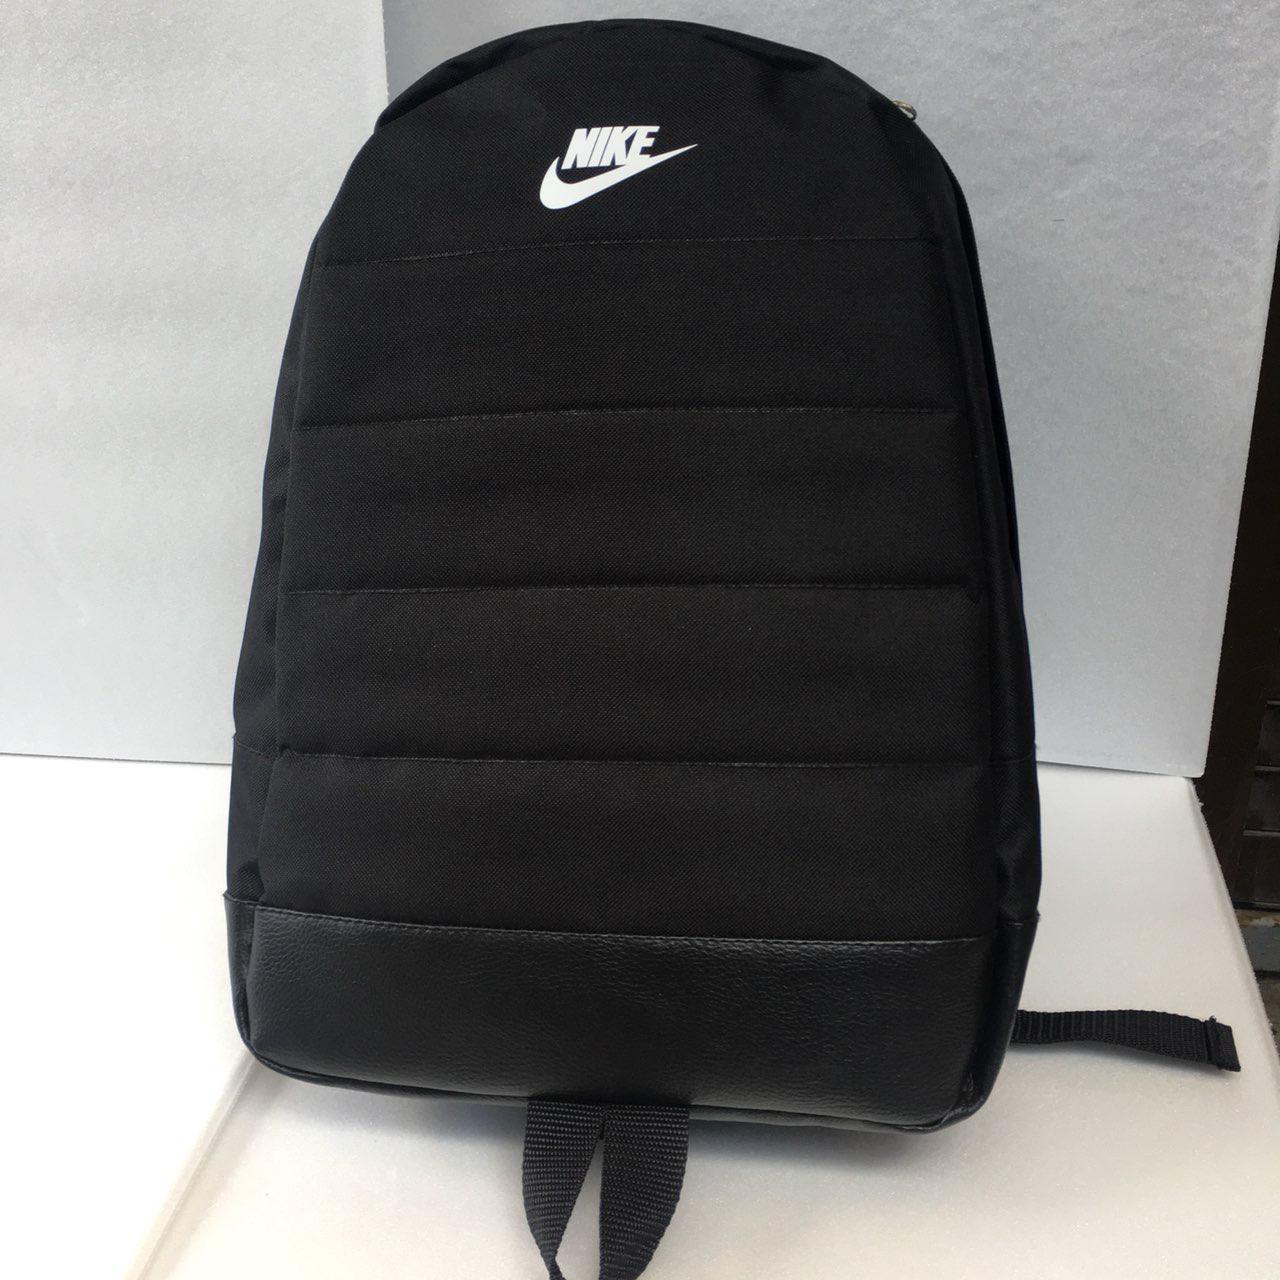 d9b45270ebaf Рюкзак спортивно-городской Nike реплика Черного цвета: продажа, цена ...